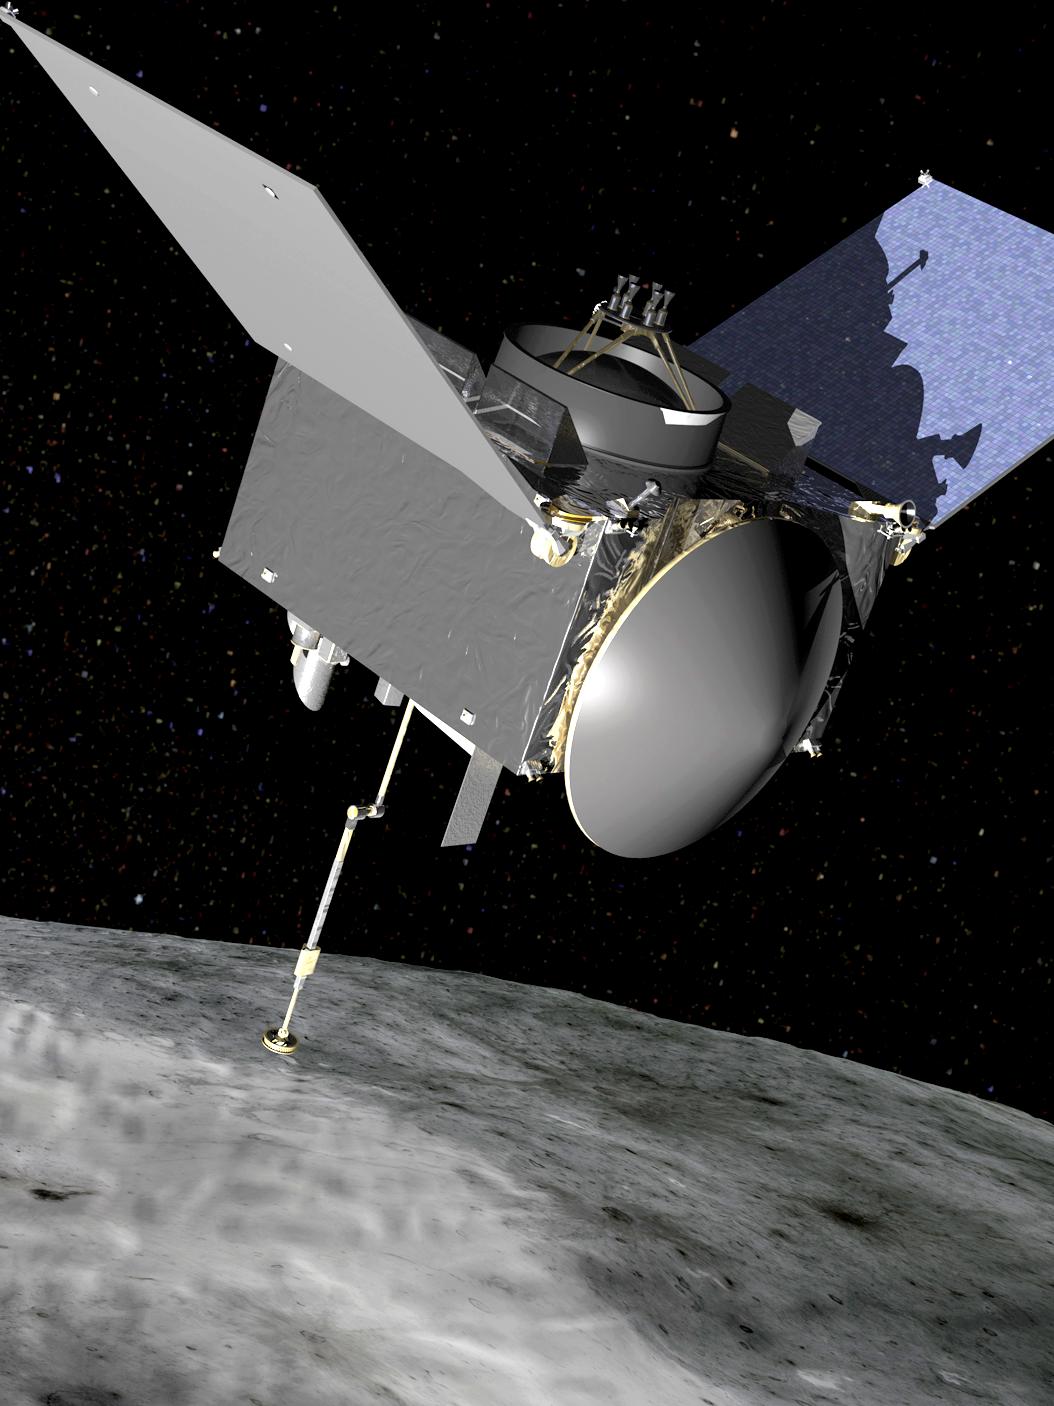 OSIRIS-REx will travel to near-Earth asteroid Benn on a sample return mission